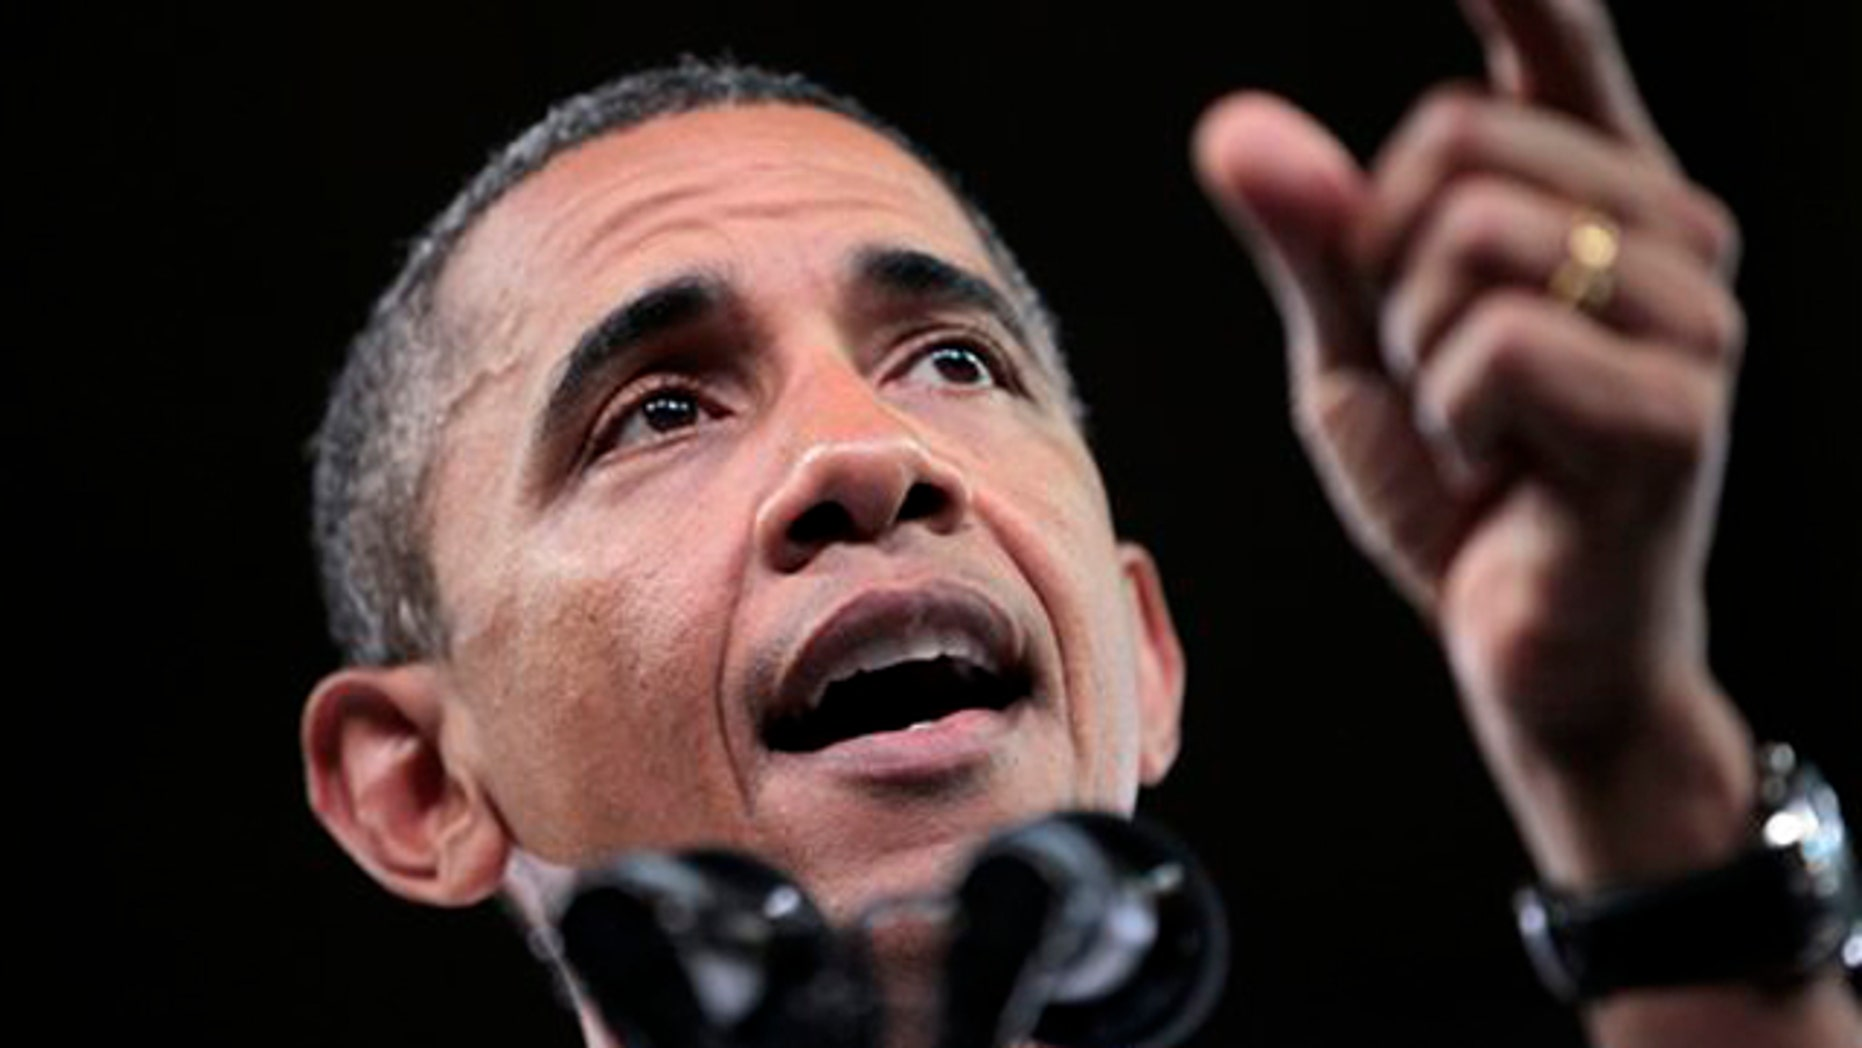 President Obama gestures as he speaks on his American Jobs Act legislation Sept. 14 at North Carolina State University in Raleigh, N.C.